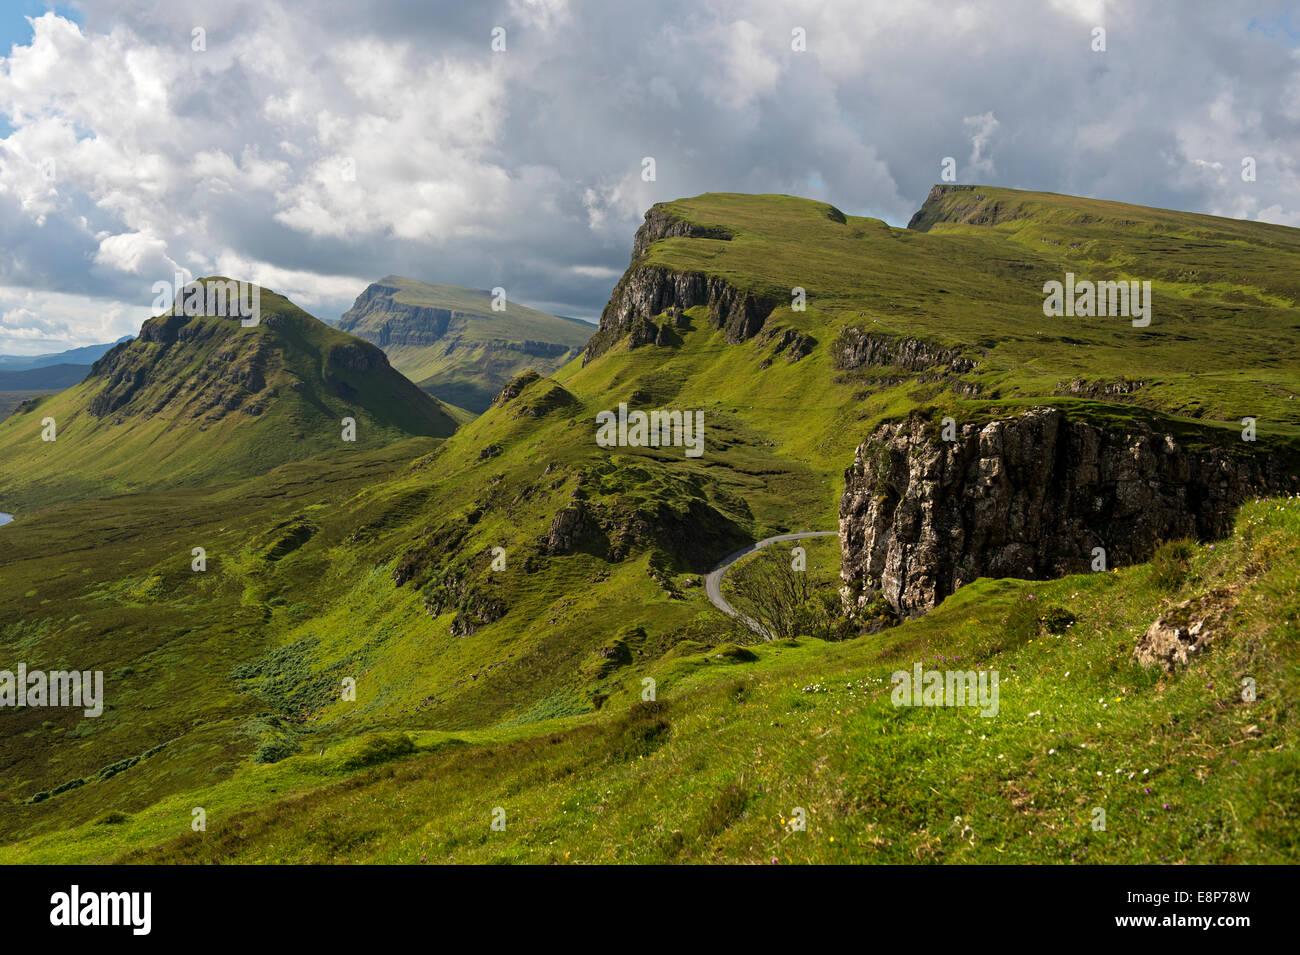 Quiraing mountain landscape of the Trotternish Ridge on the Isle of Skye, Inner Hebrides, Scotland, United Kingdom - Stock Image